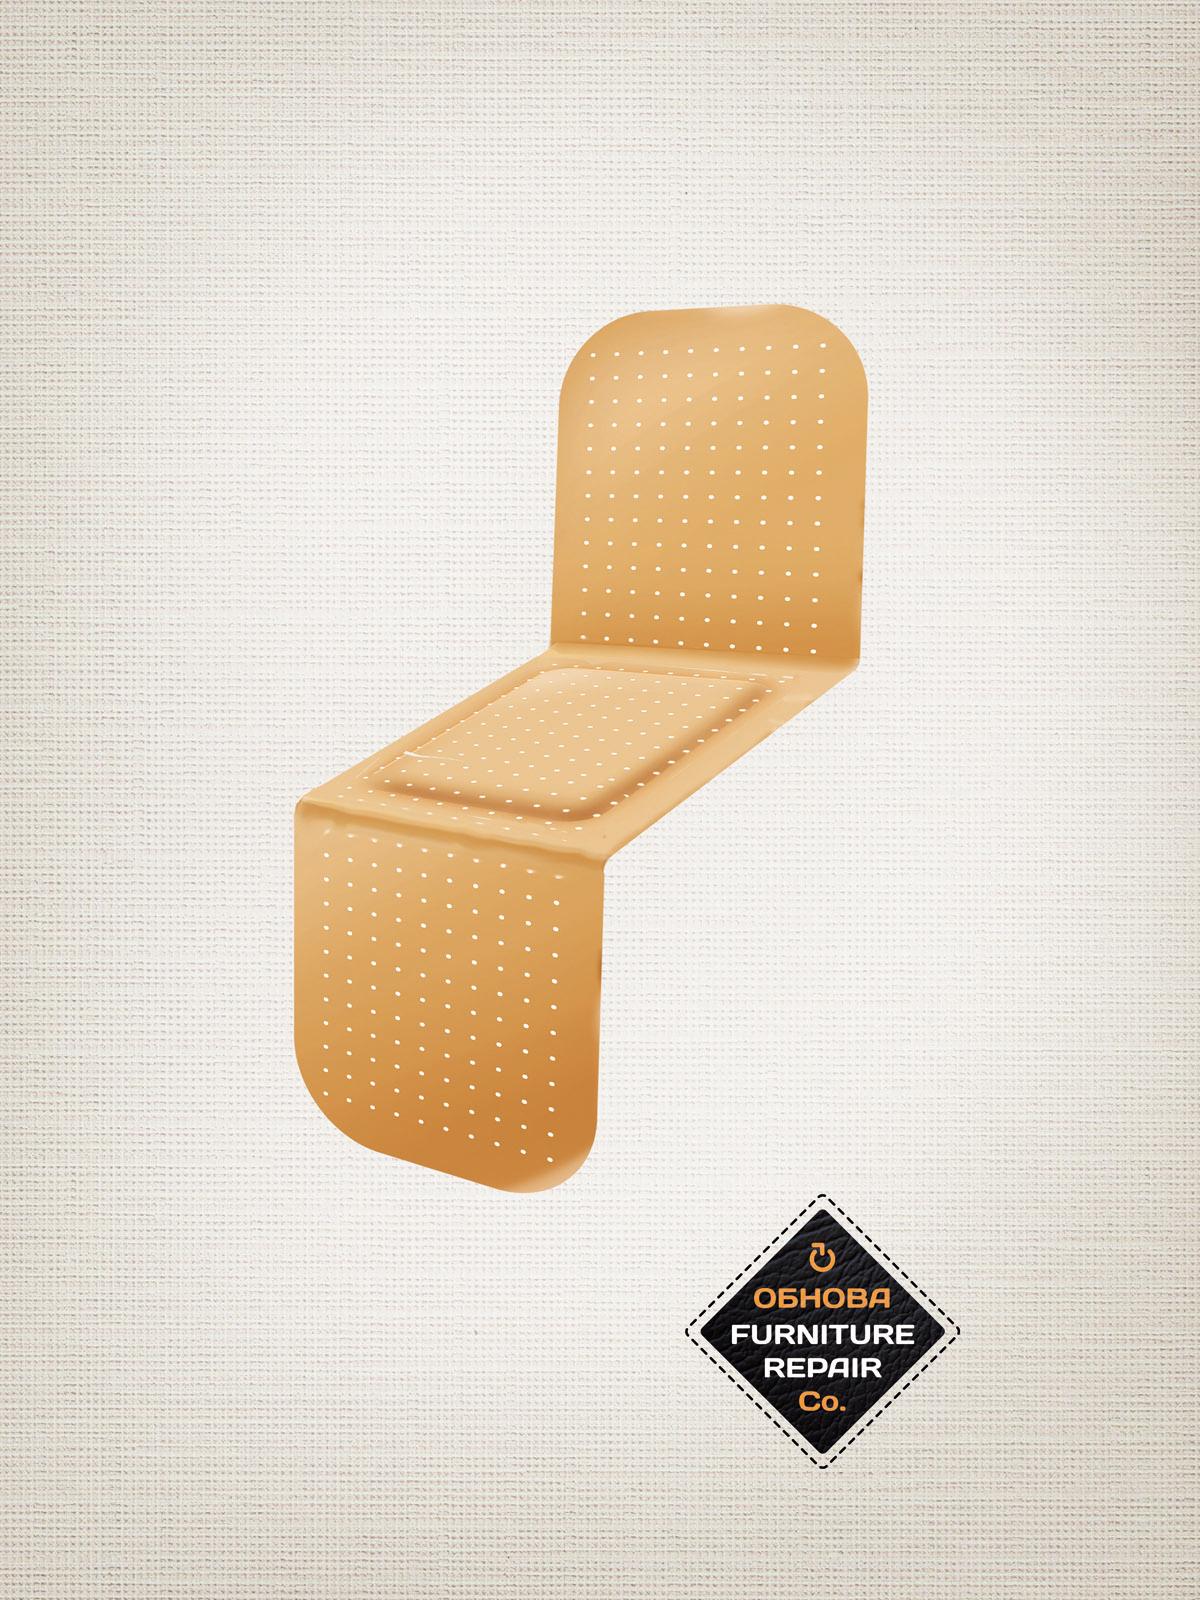 Furniture advertising ideas - Furniture advertising ideas ...